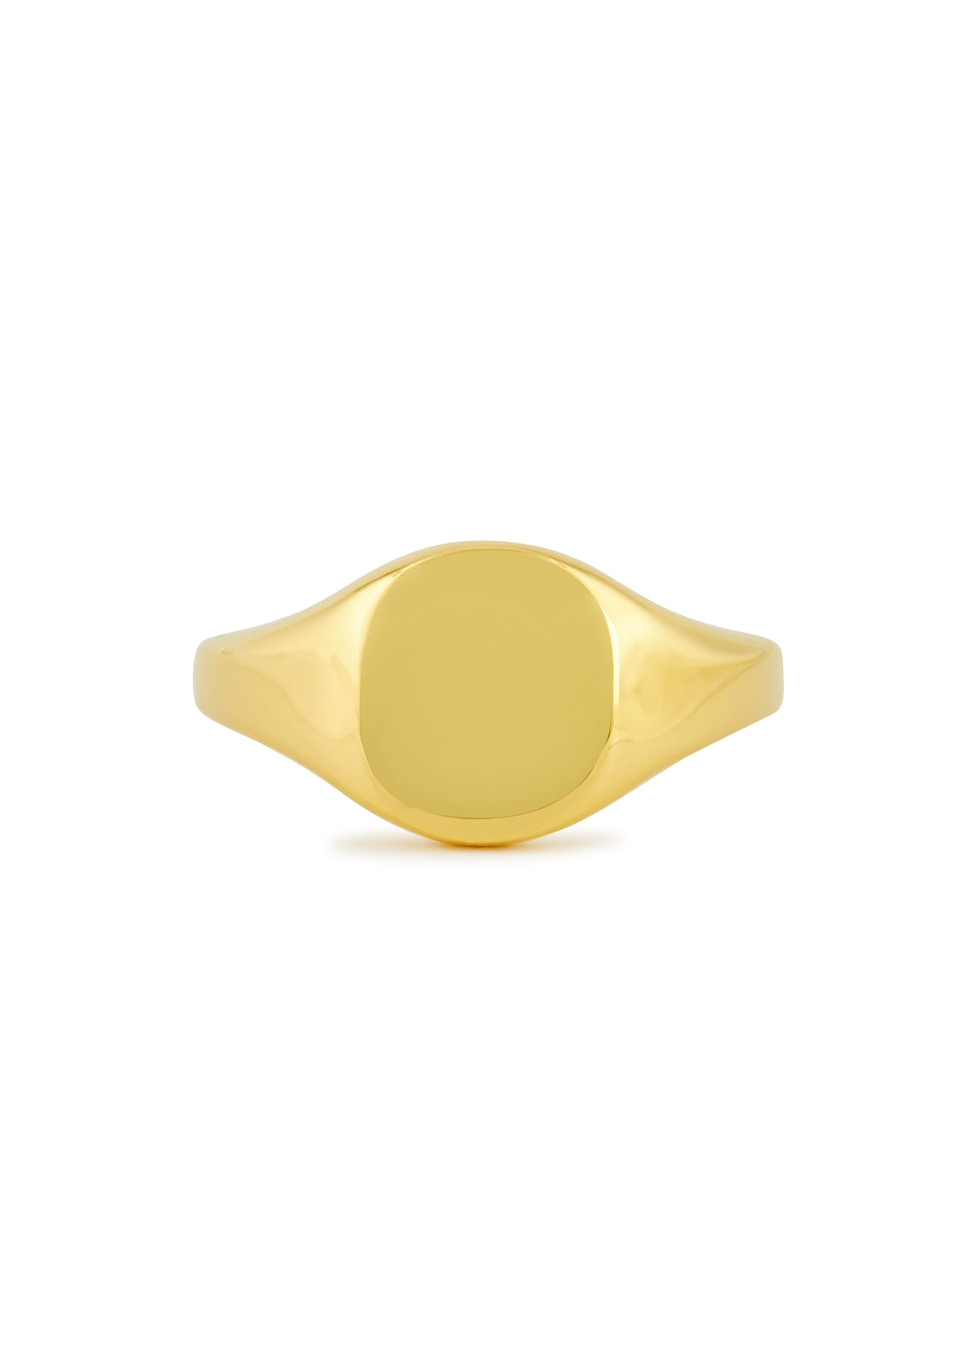 Baby Eddie 18kt gold-plated signet ring